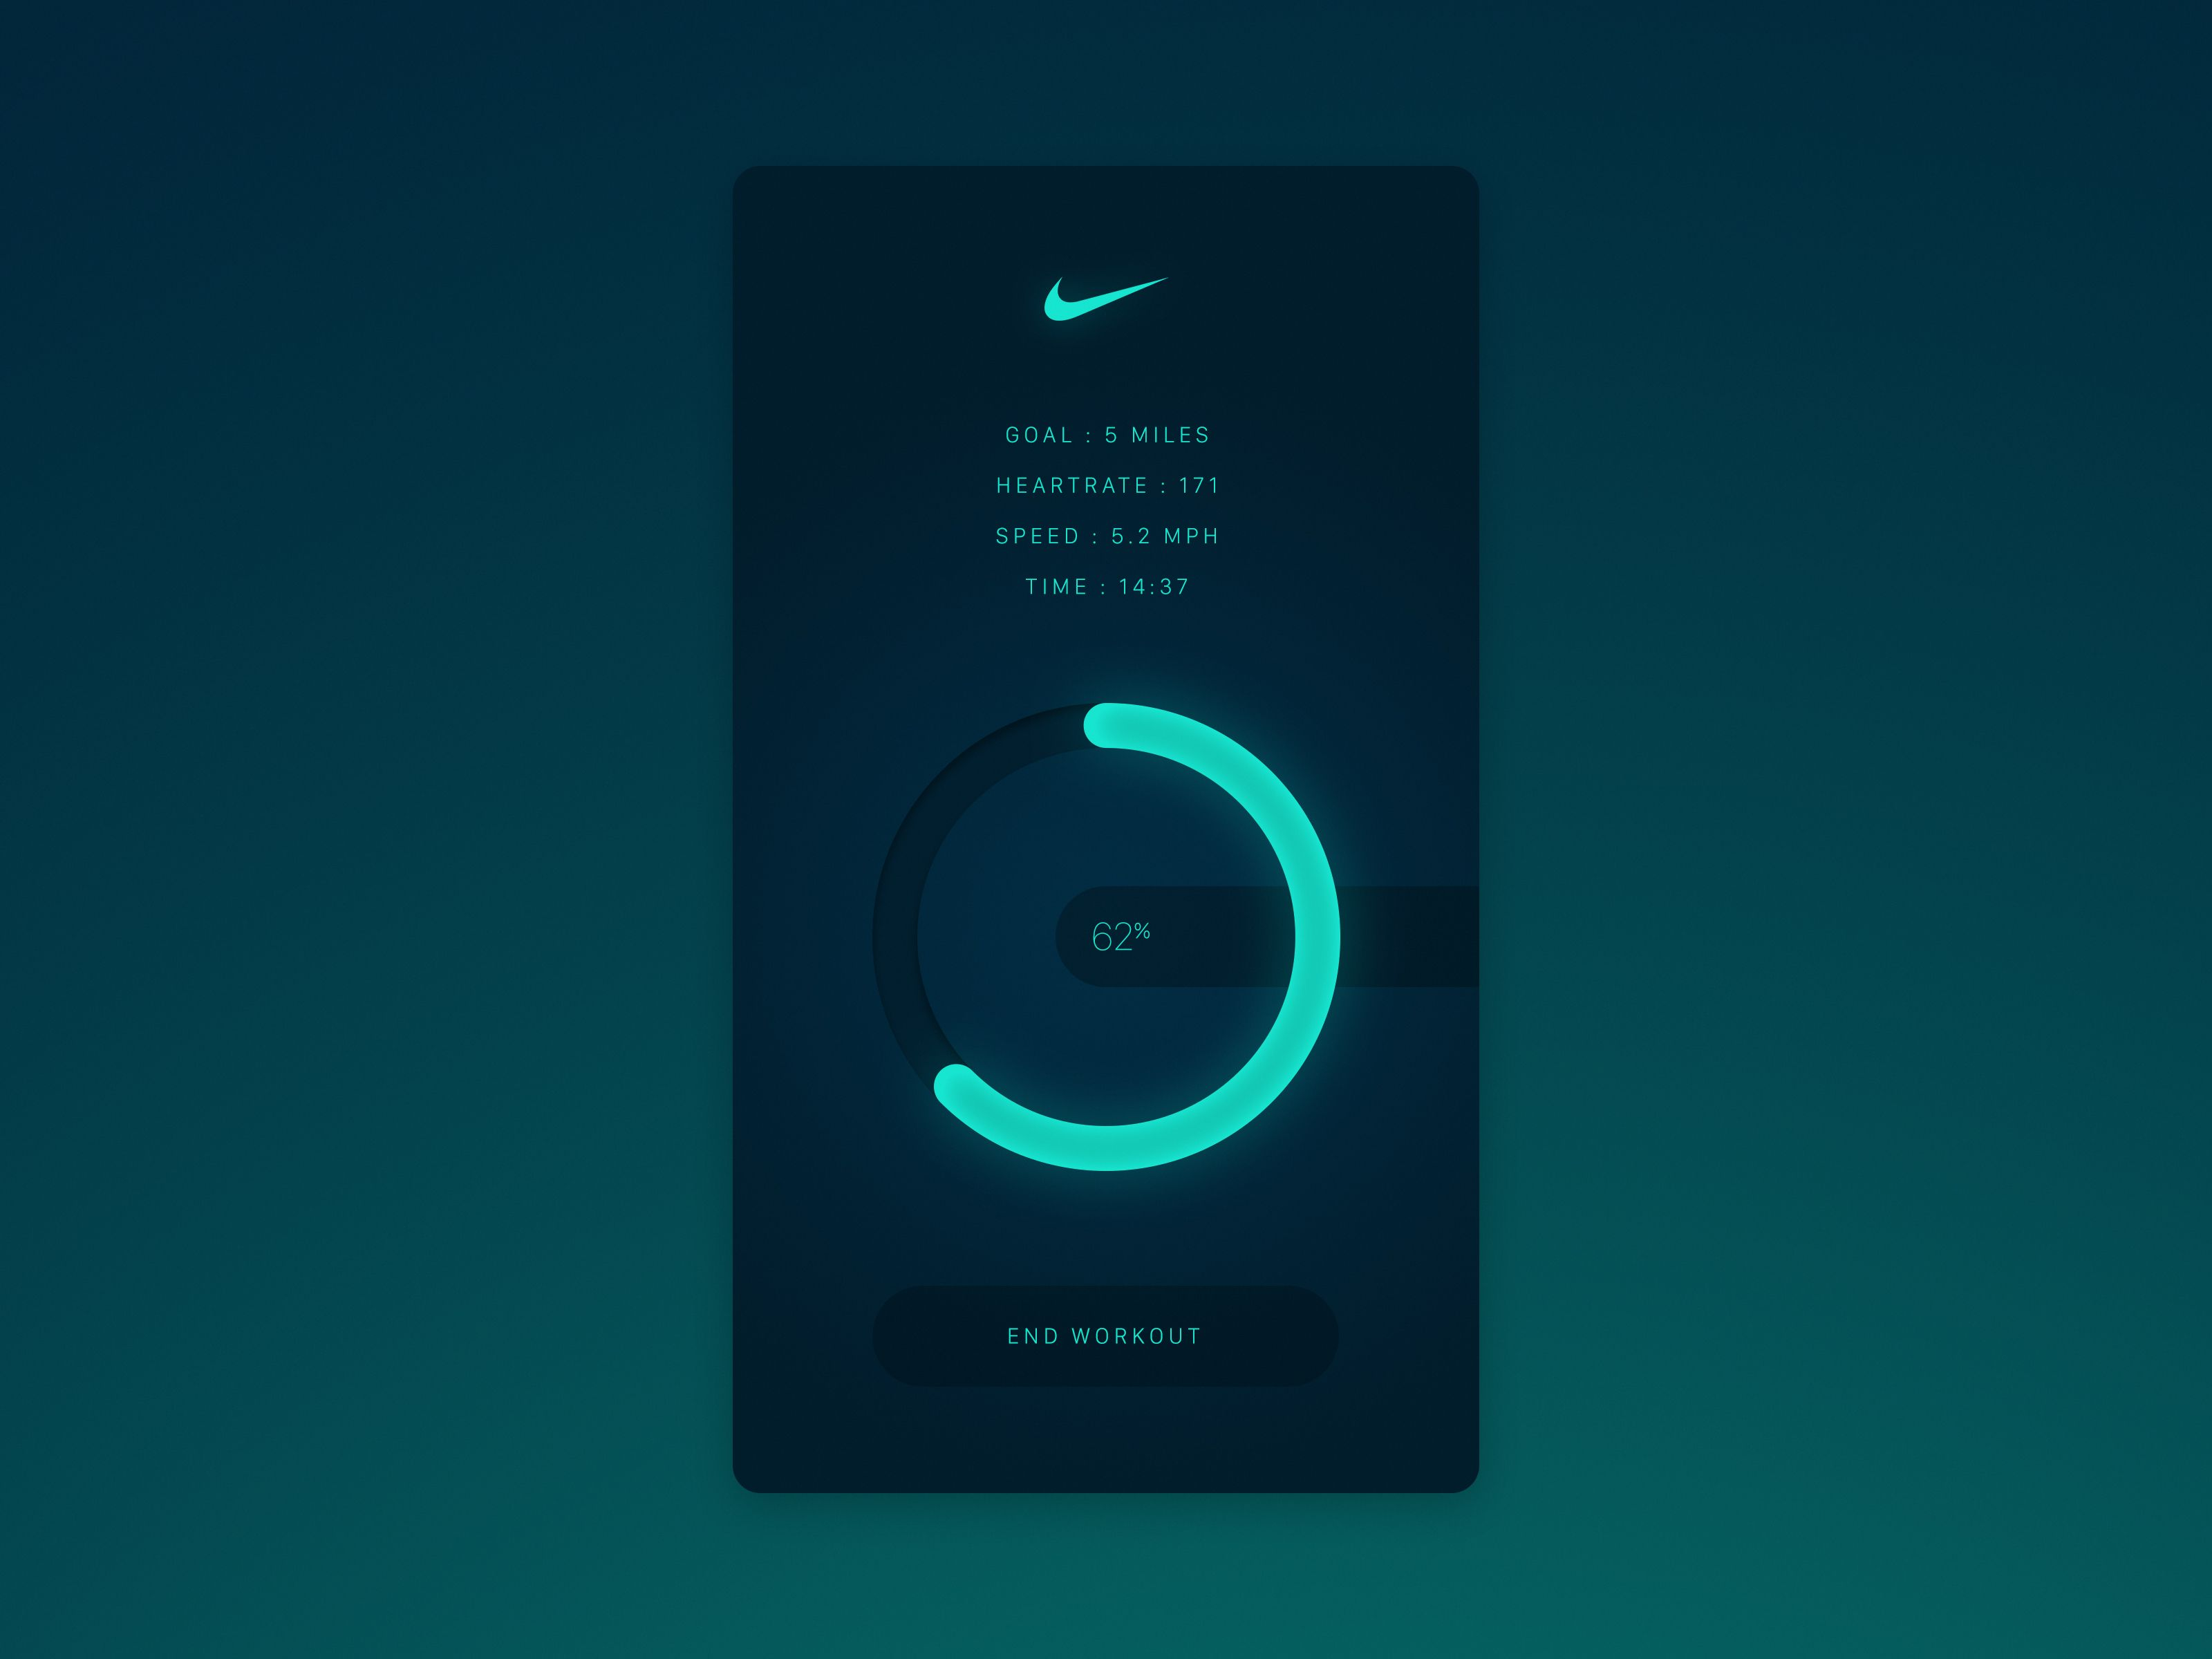 d168e4545599fece932364fedd5597a3 - How To Get Heart Rate On Nike Run Club